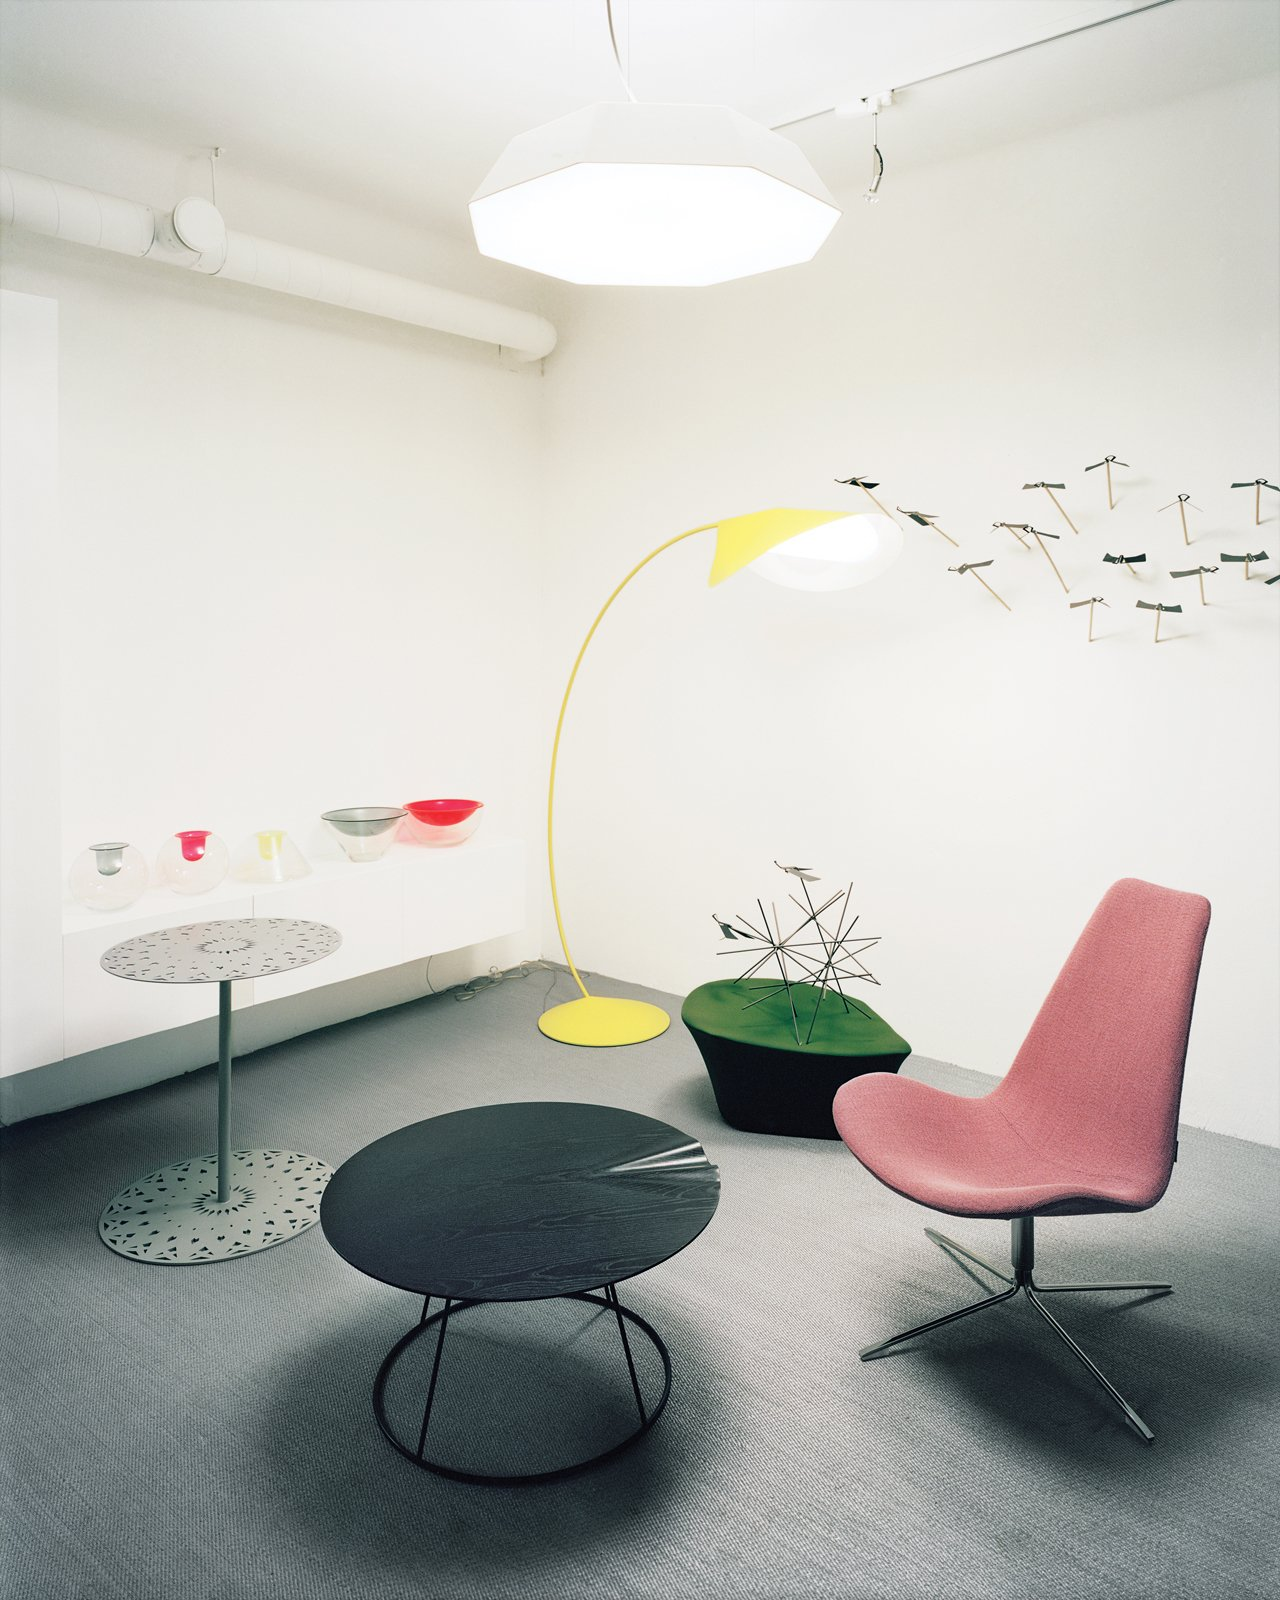 dwell 001  Design Destination: Scandinavia by Diana Budds from Swedish Designer Focus: Monica Förster